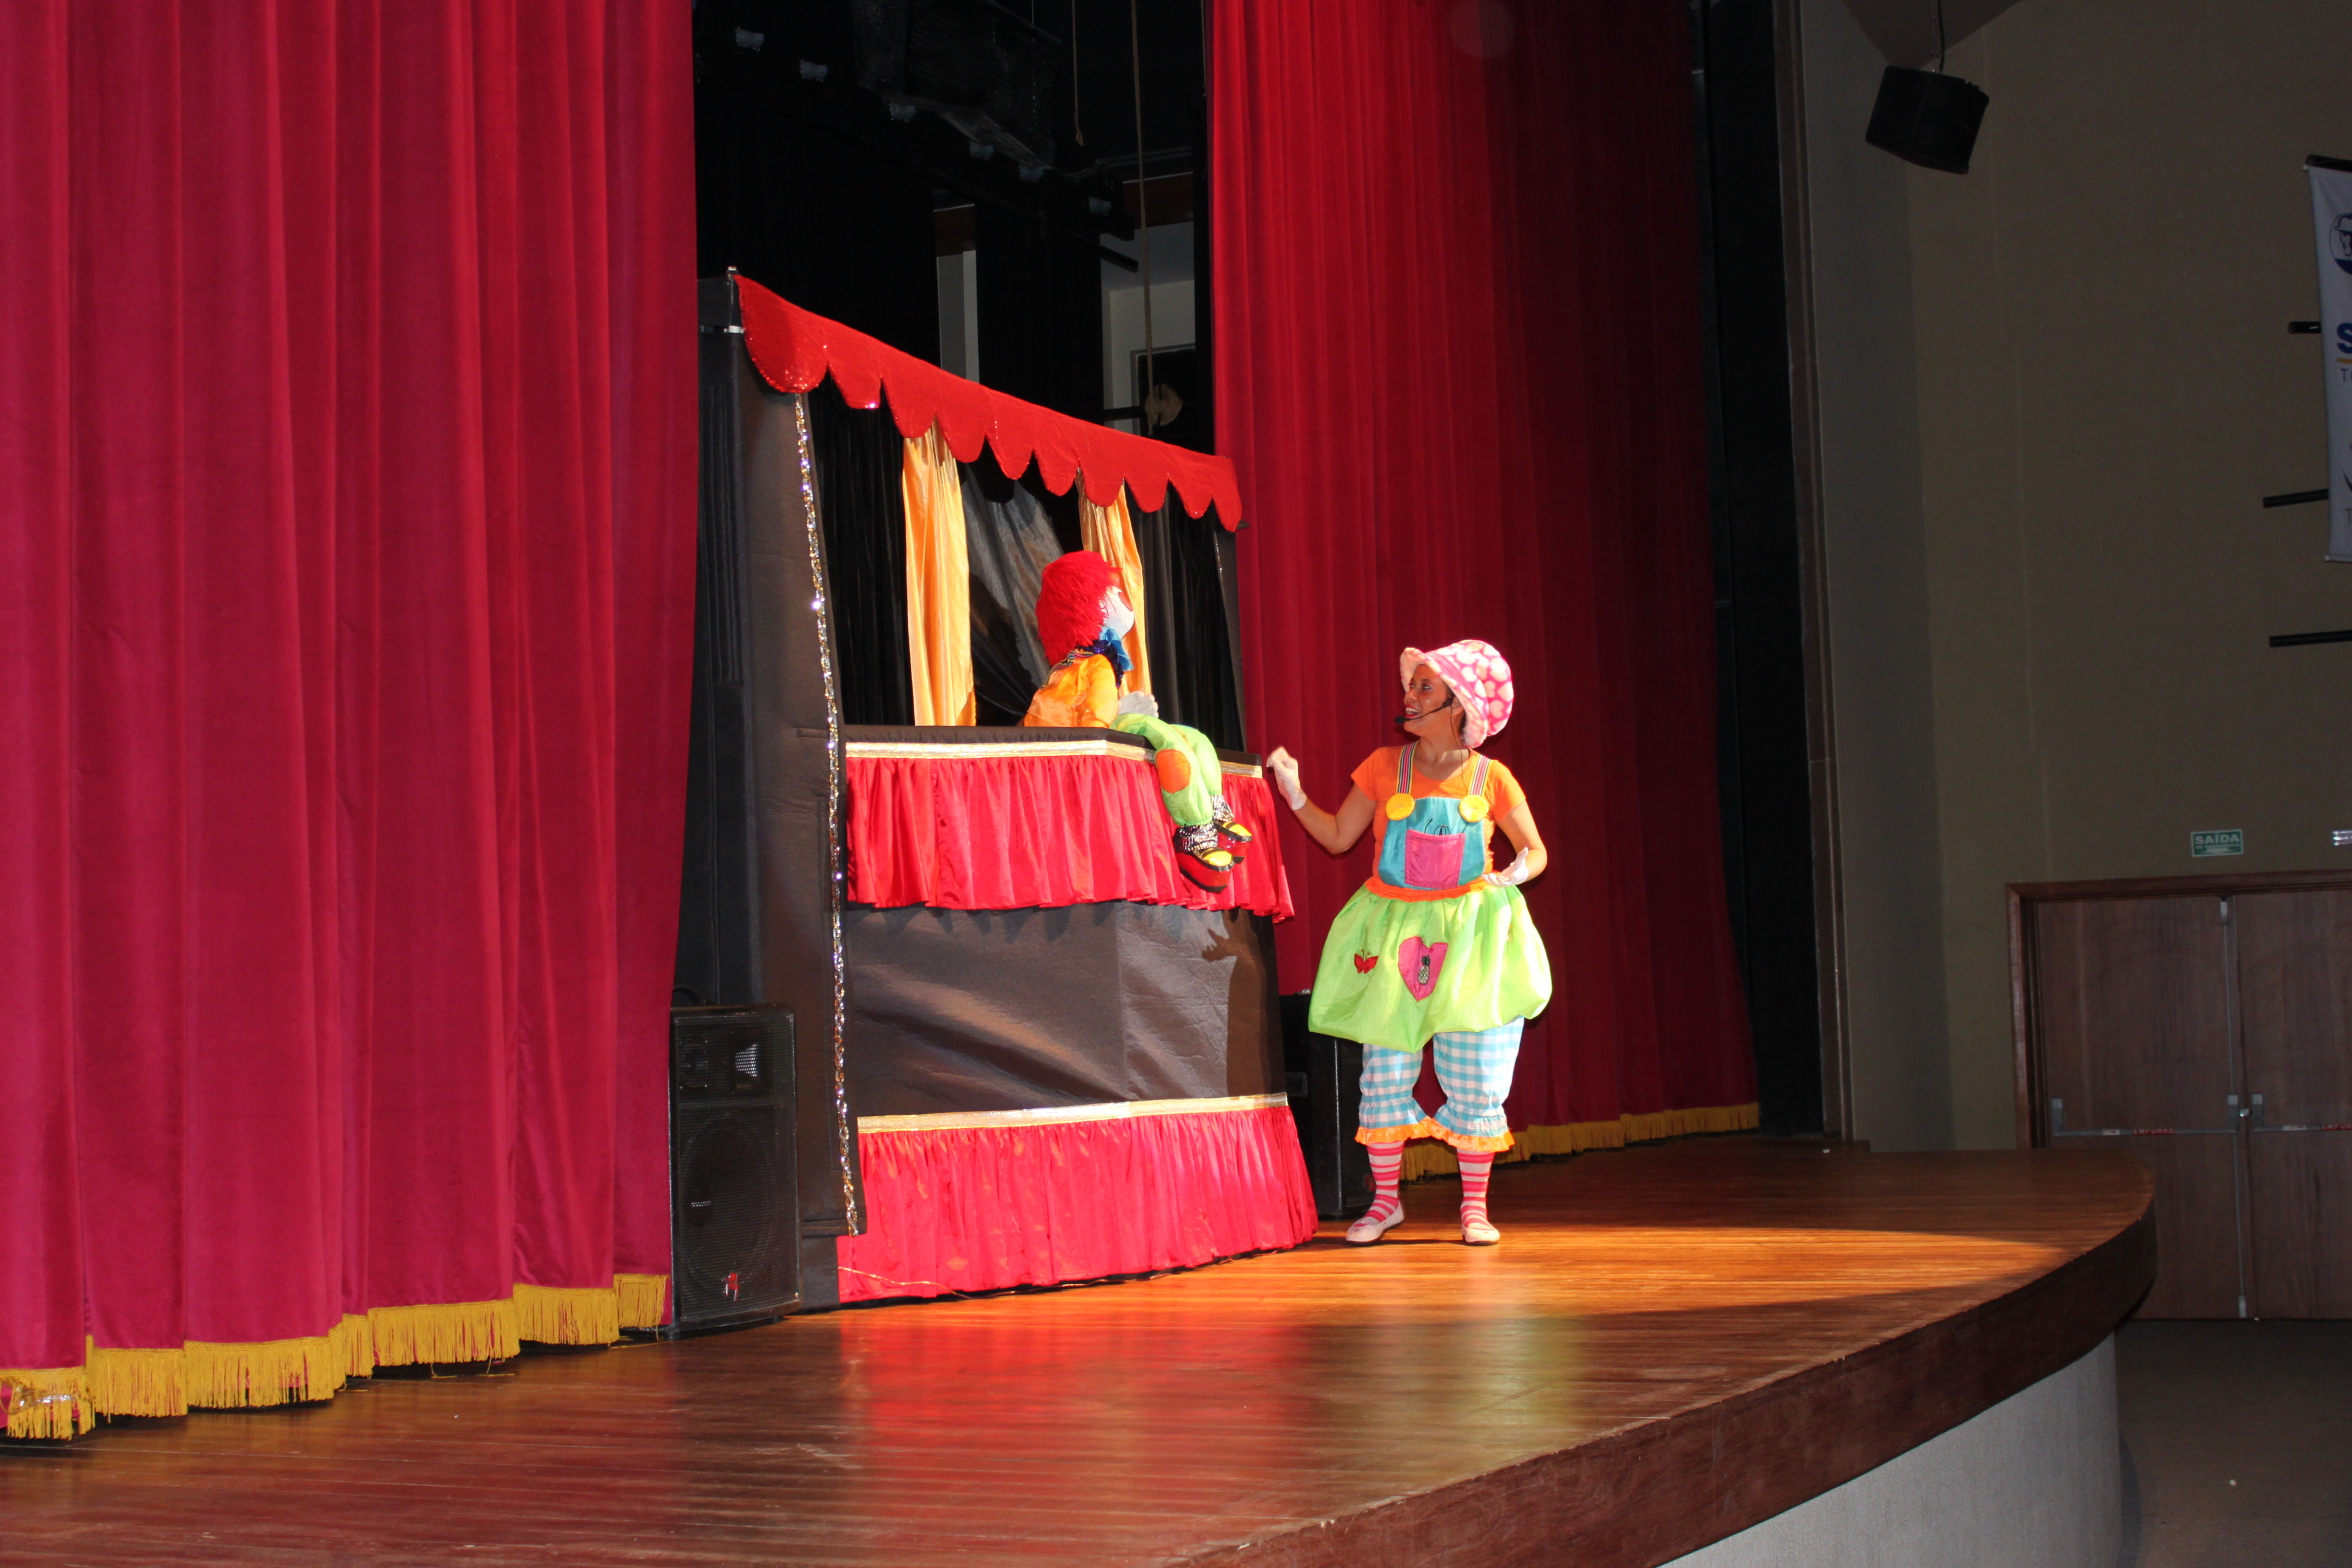 Apresentaçao teatro brasilia.